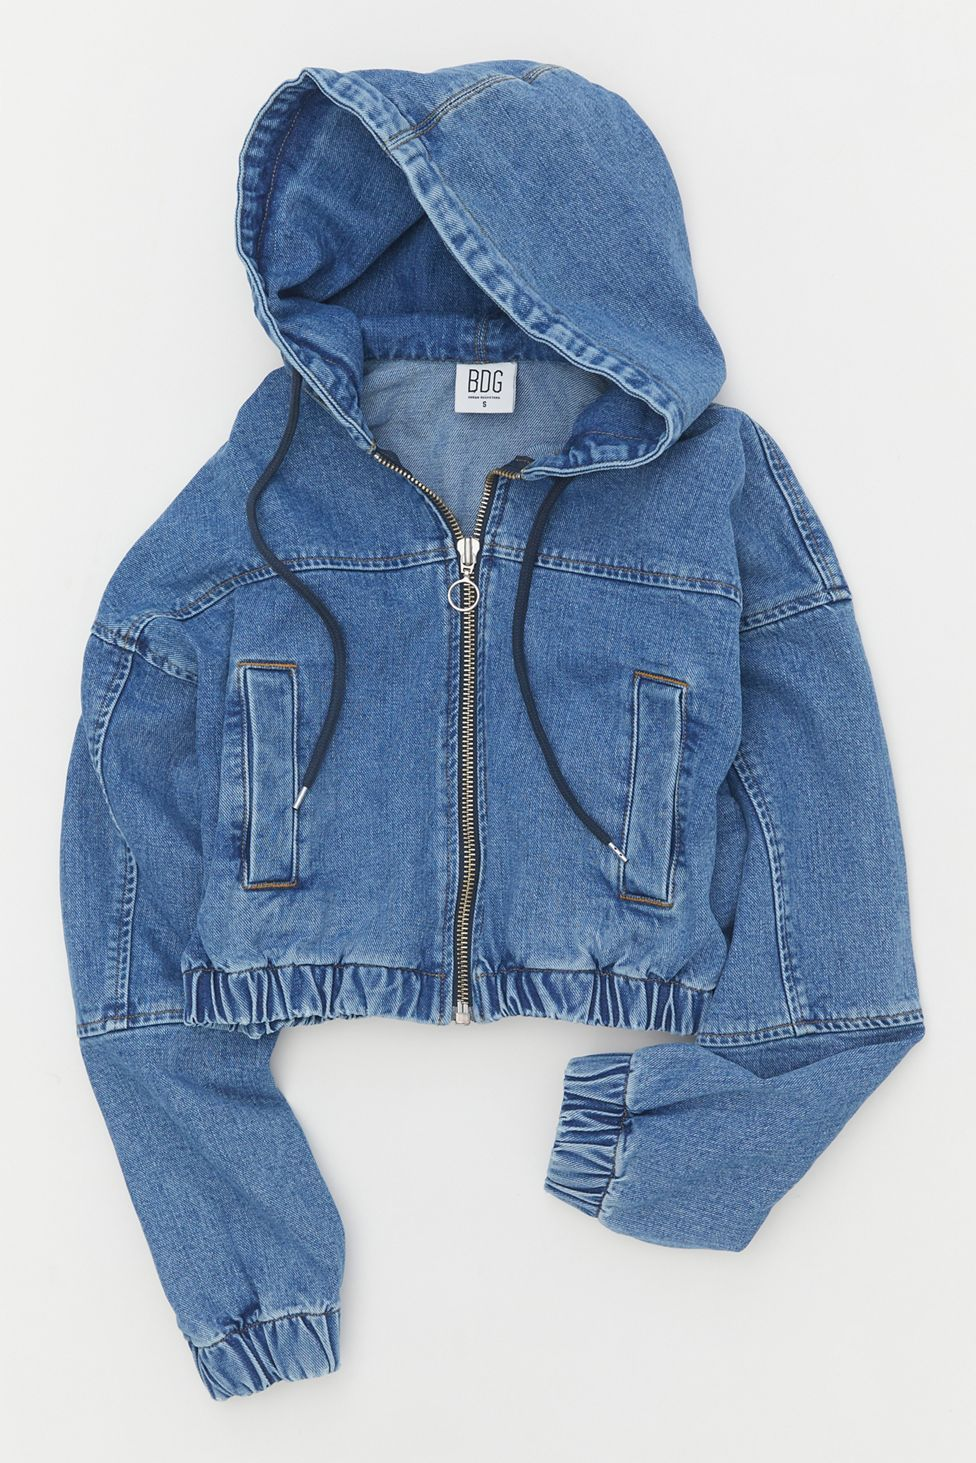 Bdg Denim Hooded Bomber Jacket Urban Outfitters Girls Denim Jacket Denim Jacket Women Bomber Jacket Outfit [ 1463 x 976 Pixel ]